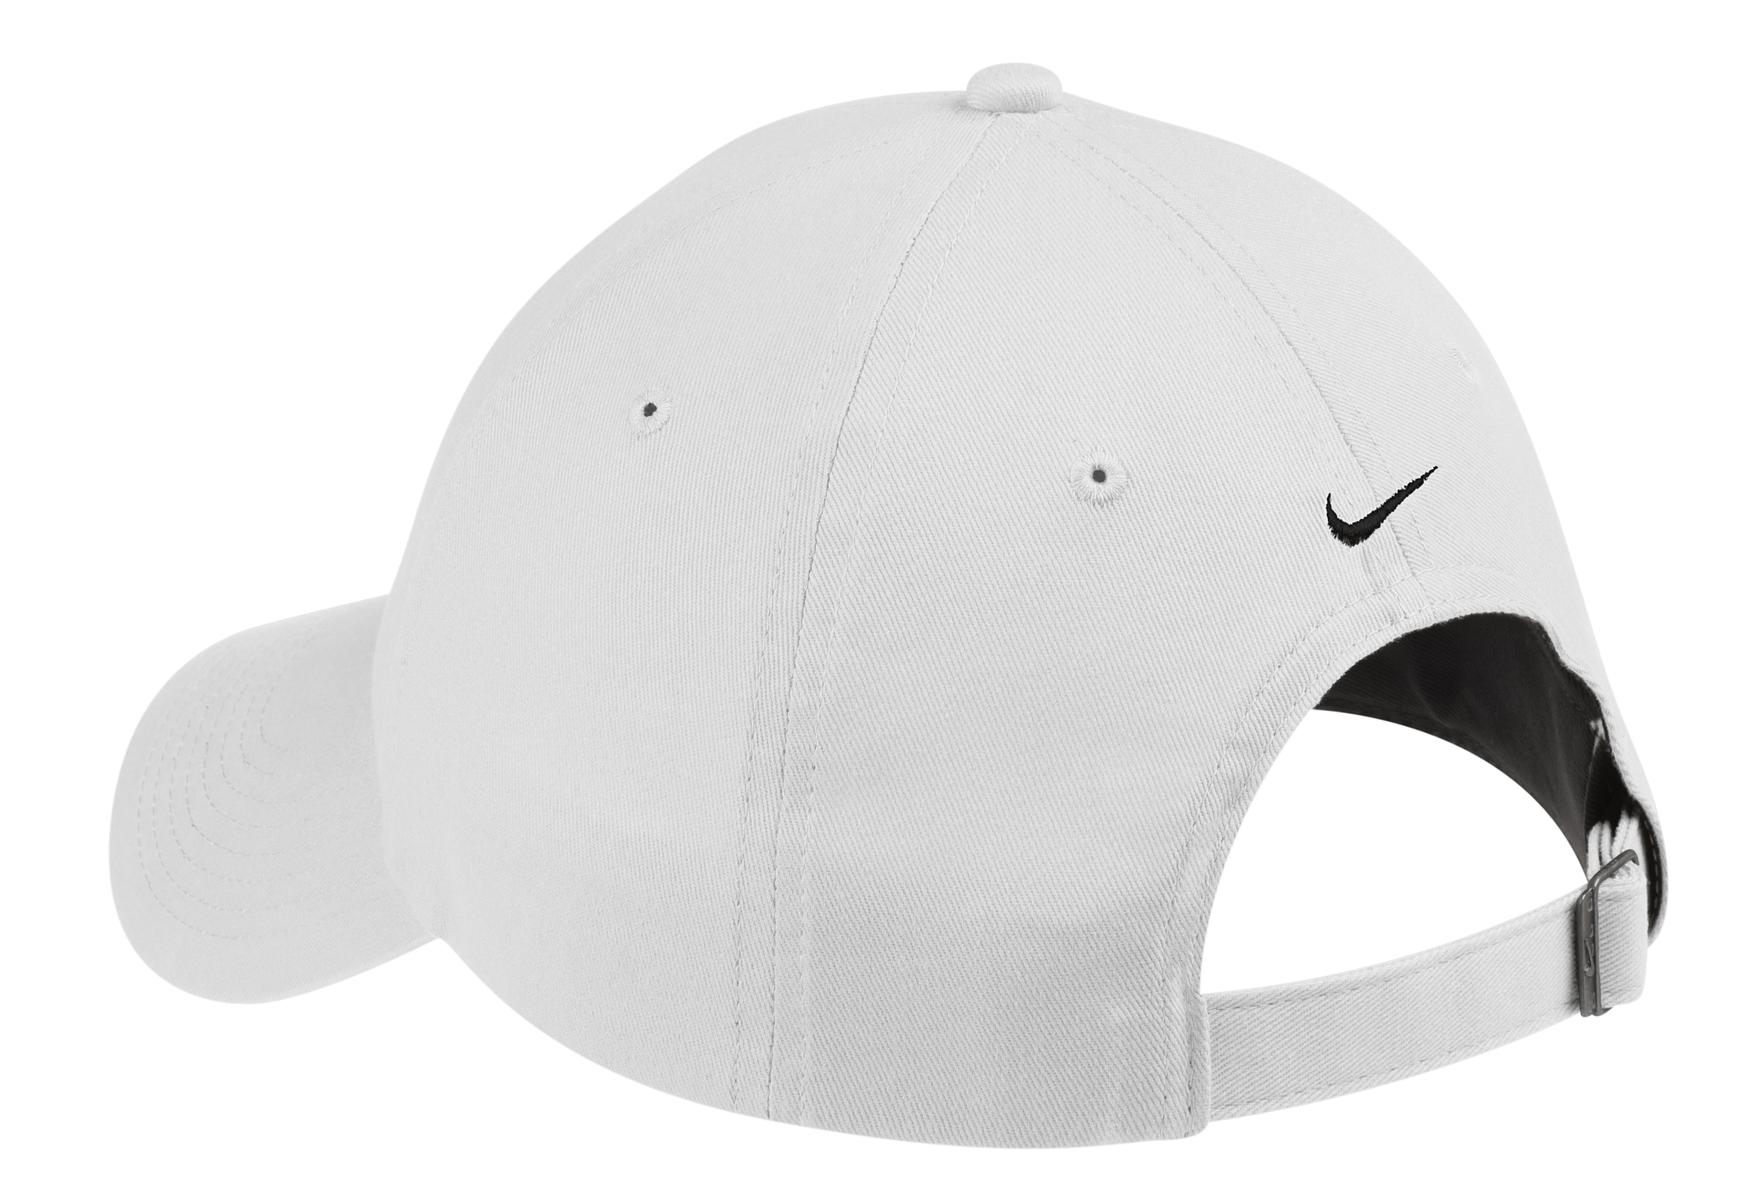 info for b8cb8 62b30 Nike Golf - Unstructured Twill Cap - RCG3220 ...